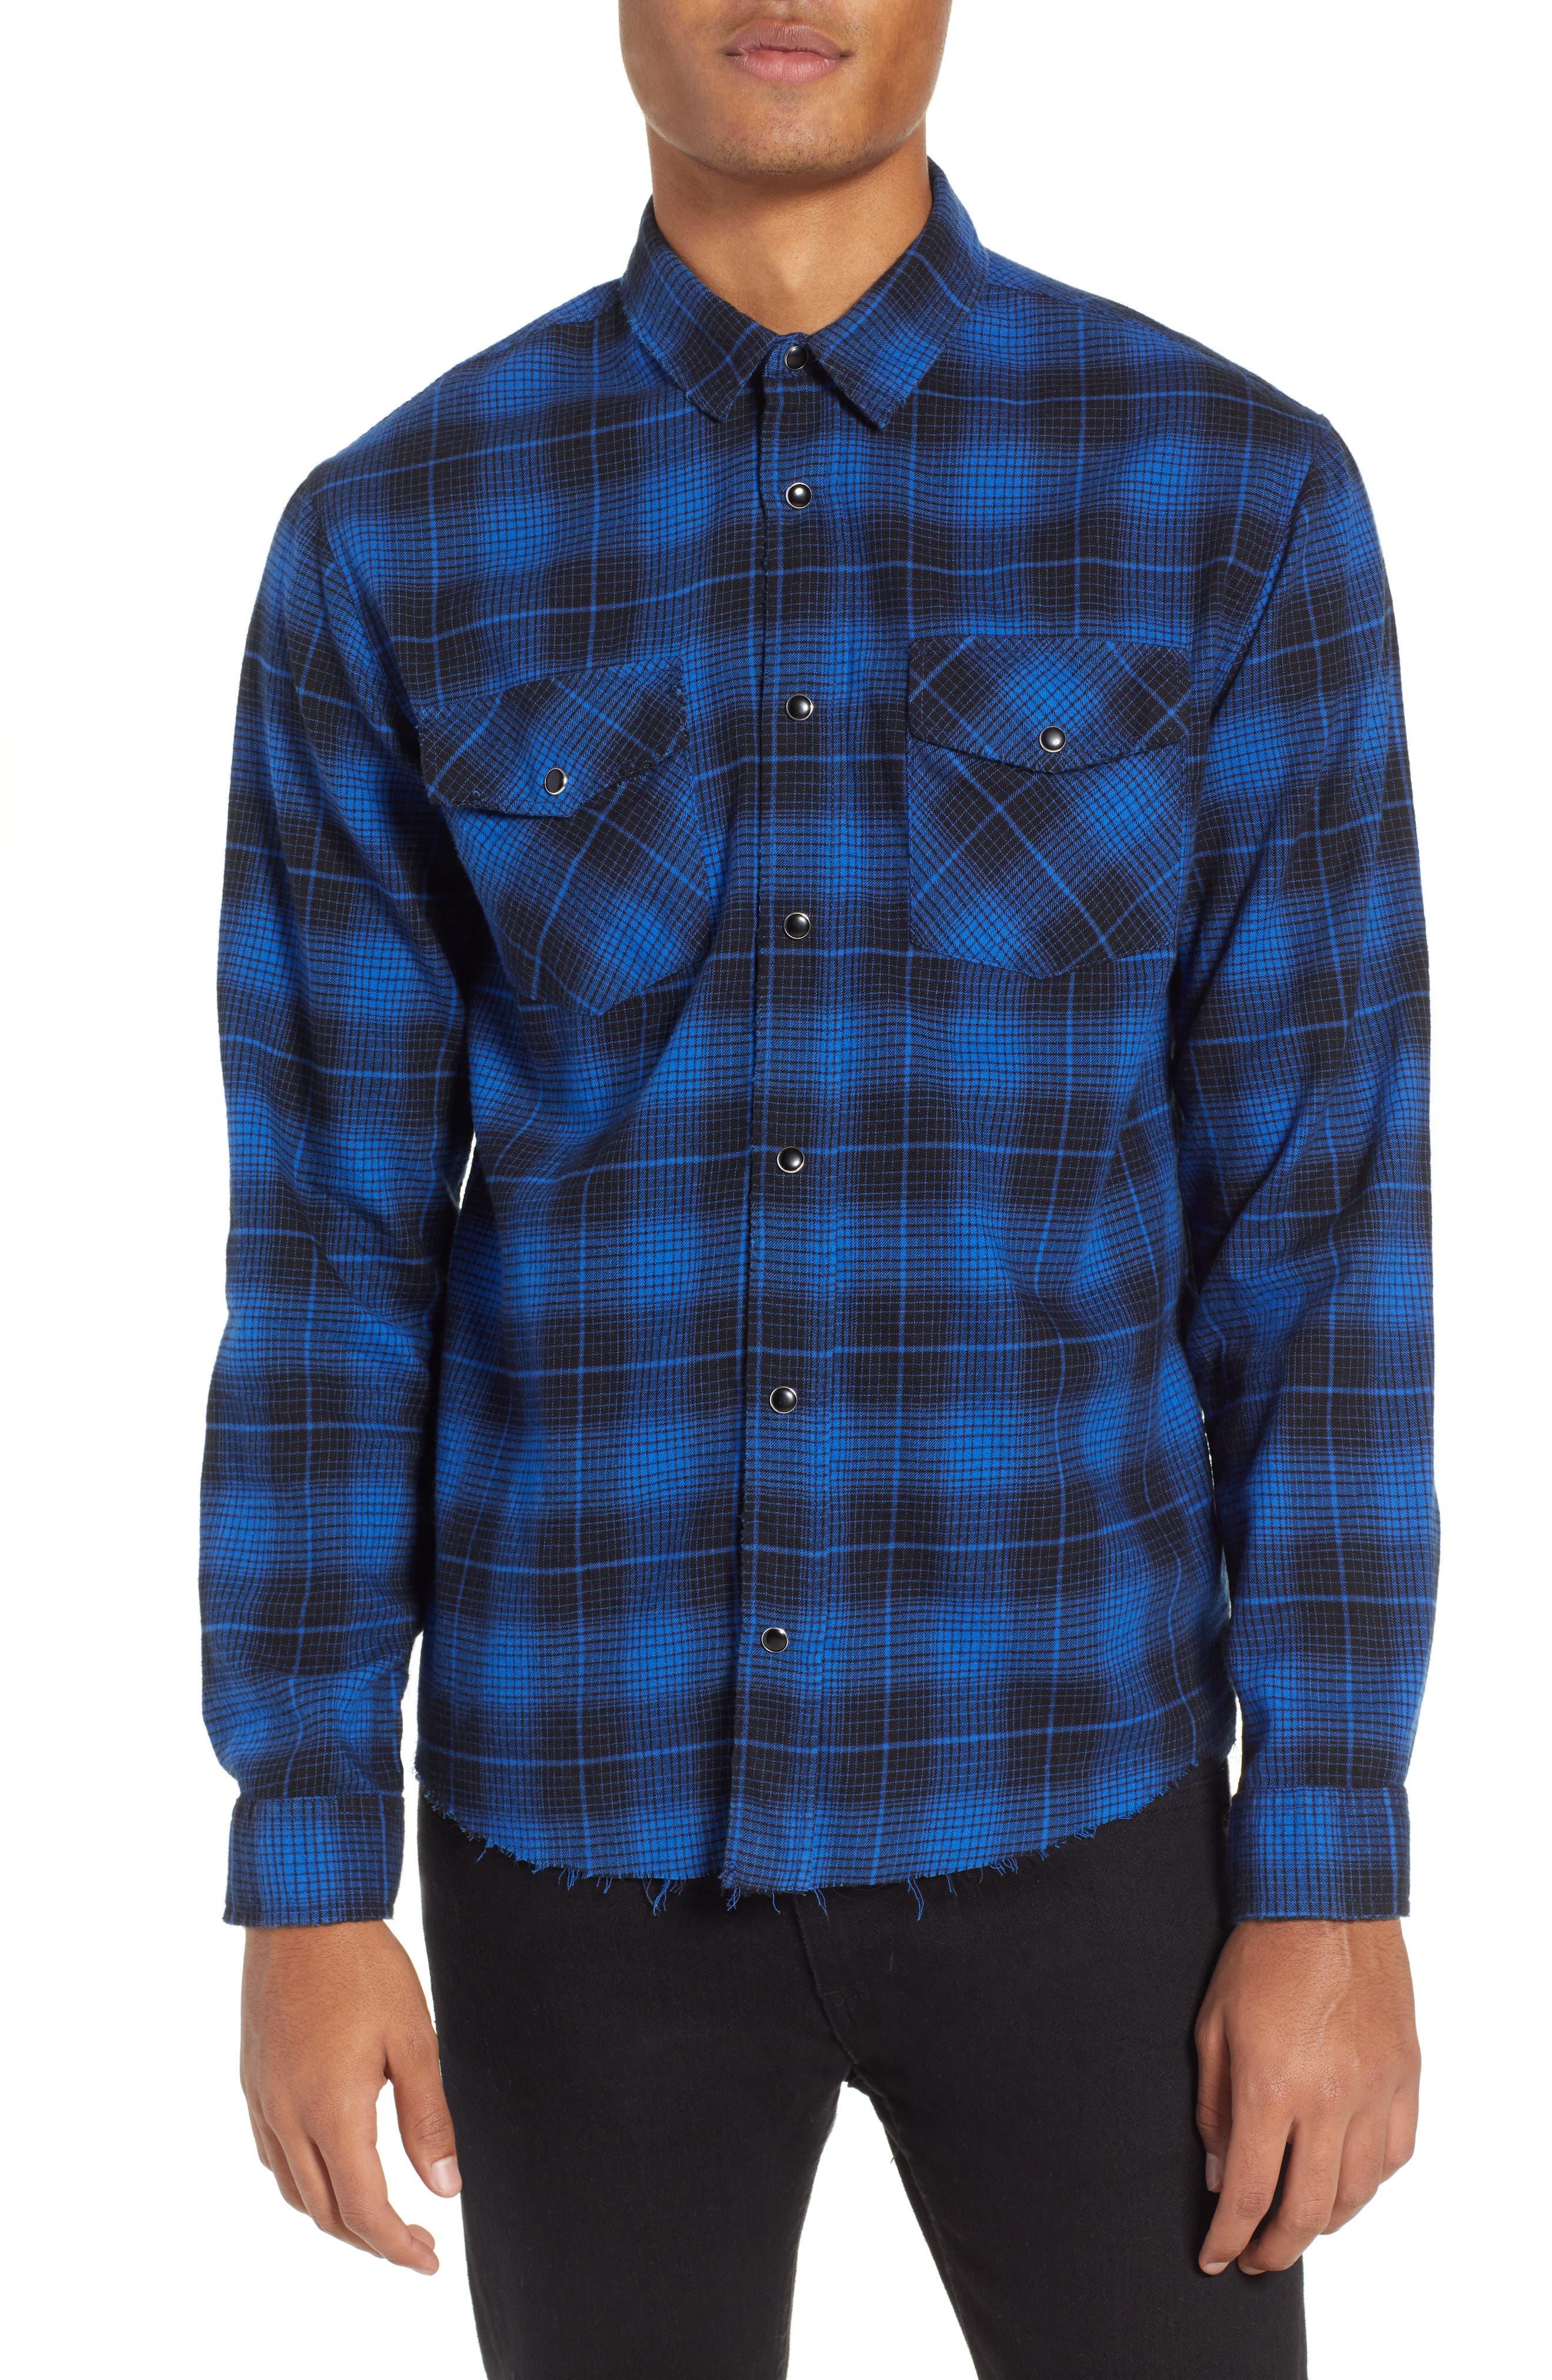 THE KOOPLES Plaid Flannel Shirt, Main, color, 400